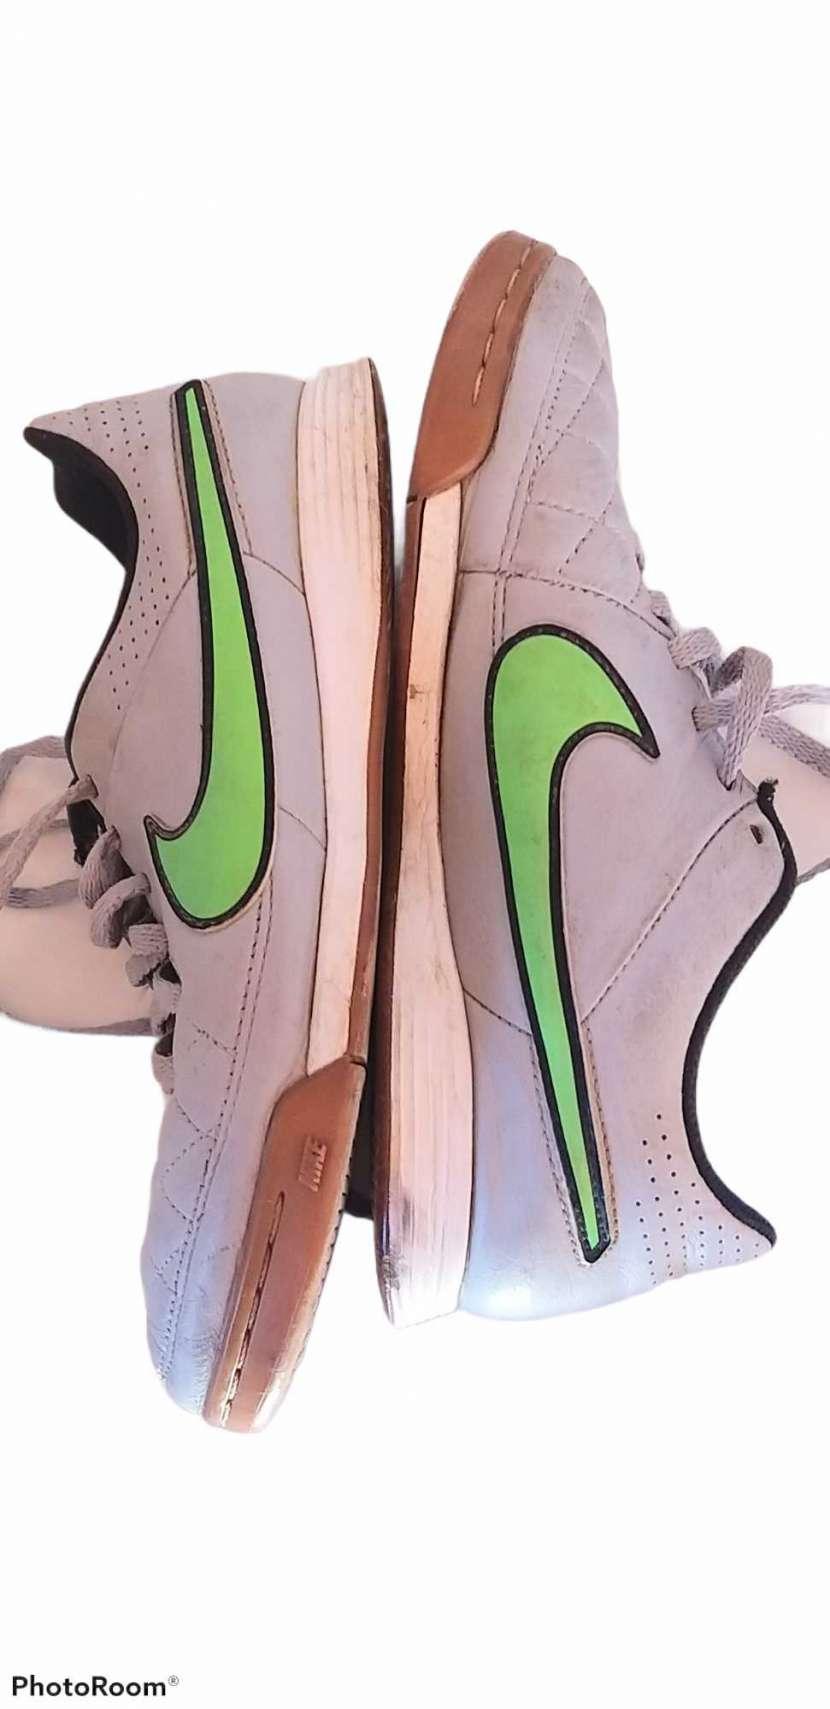 Calzado Nike Tiempo para futsal calce 38 - 2